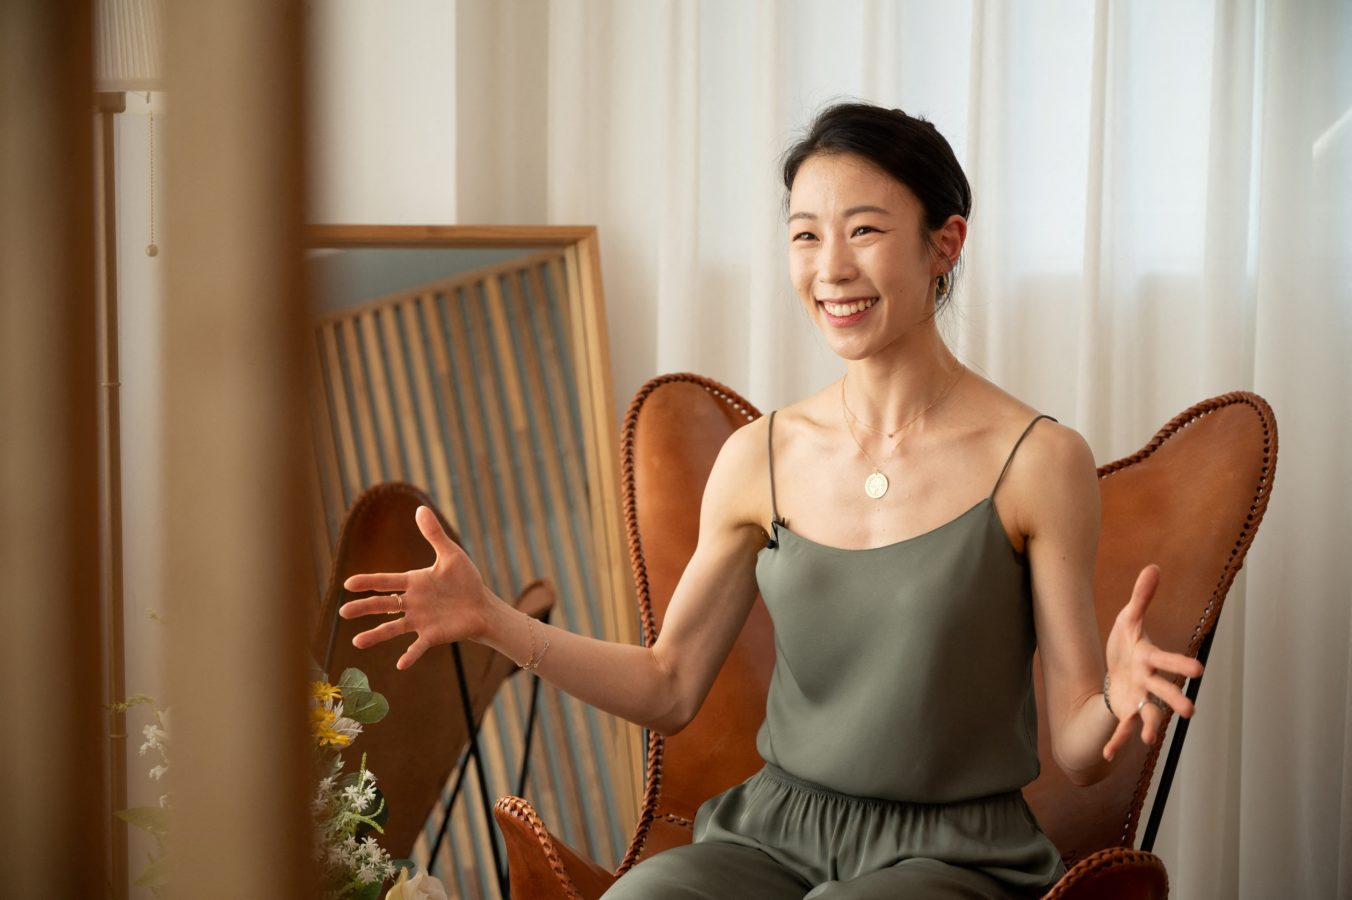 Paris Opera Ballet's first Asian etoile ballerina, Sae Eun Park